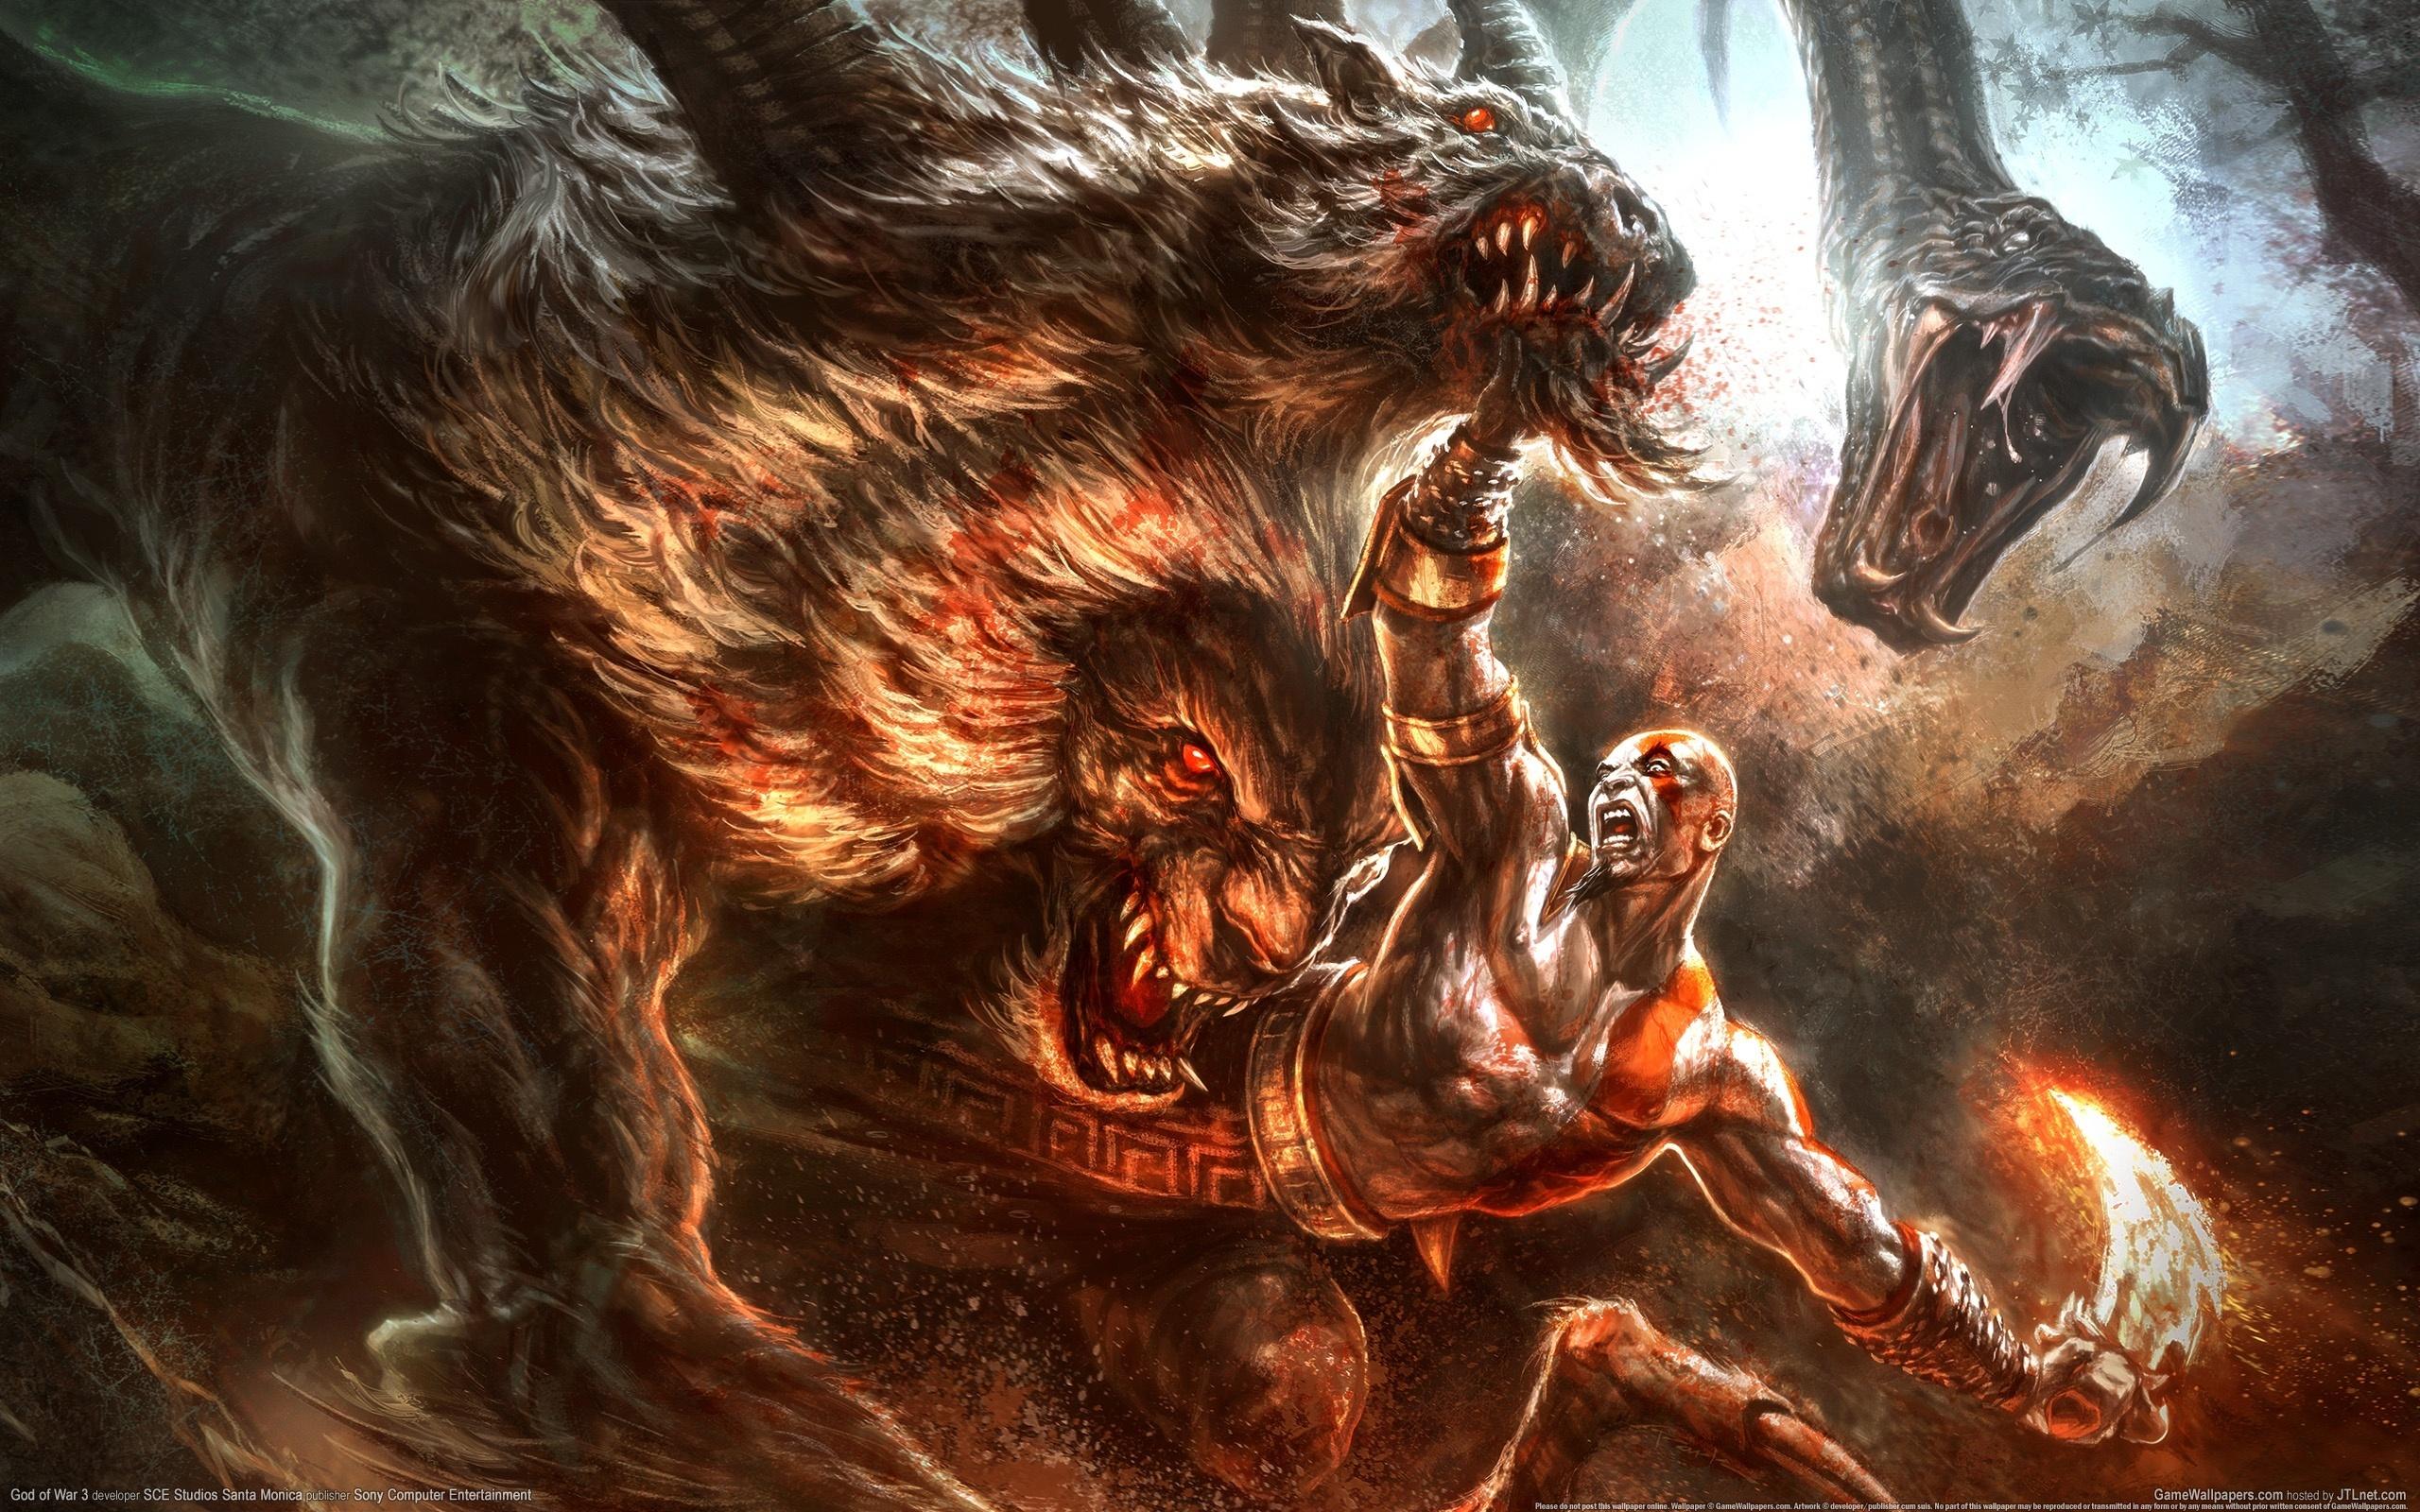 Гнев титанов, монст, Химера  № 1524067 бесплатно